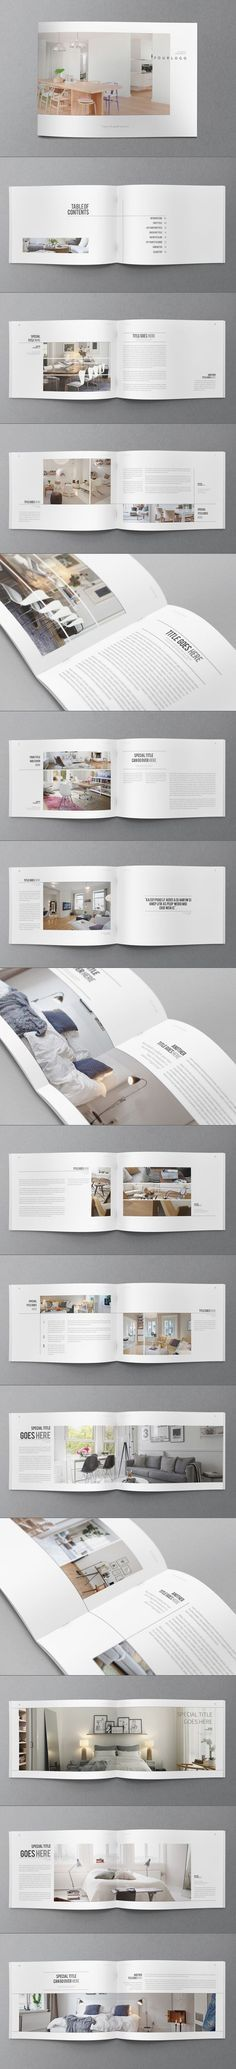 Minimal Interior Design Brochure. Download here: http://graphicriver.net/item/minimal-interior-design-brochure/8925678?ref=abradesign #design #brochure: